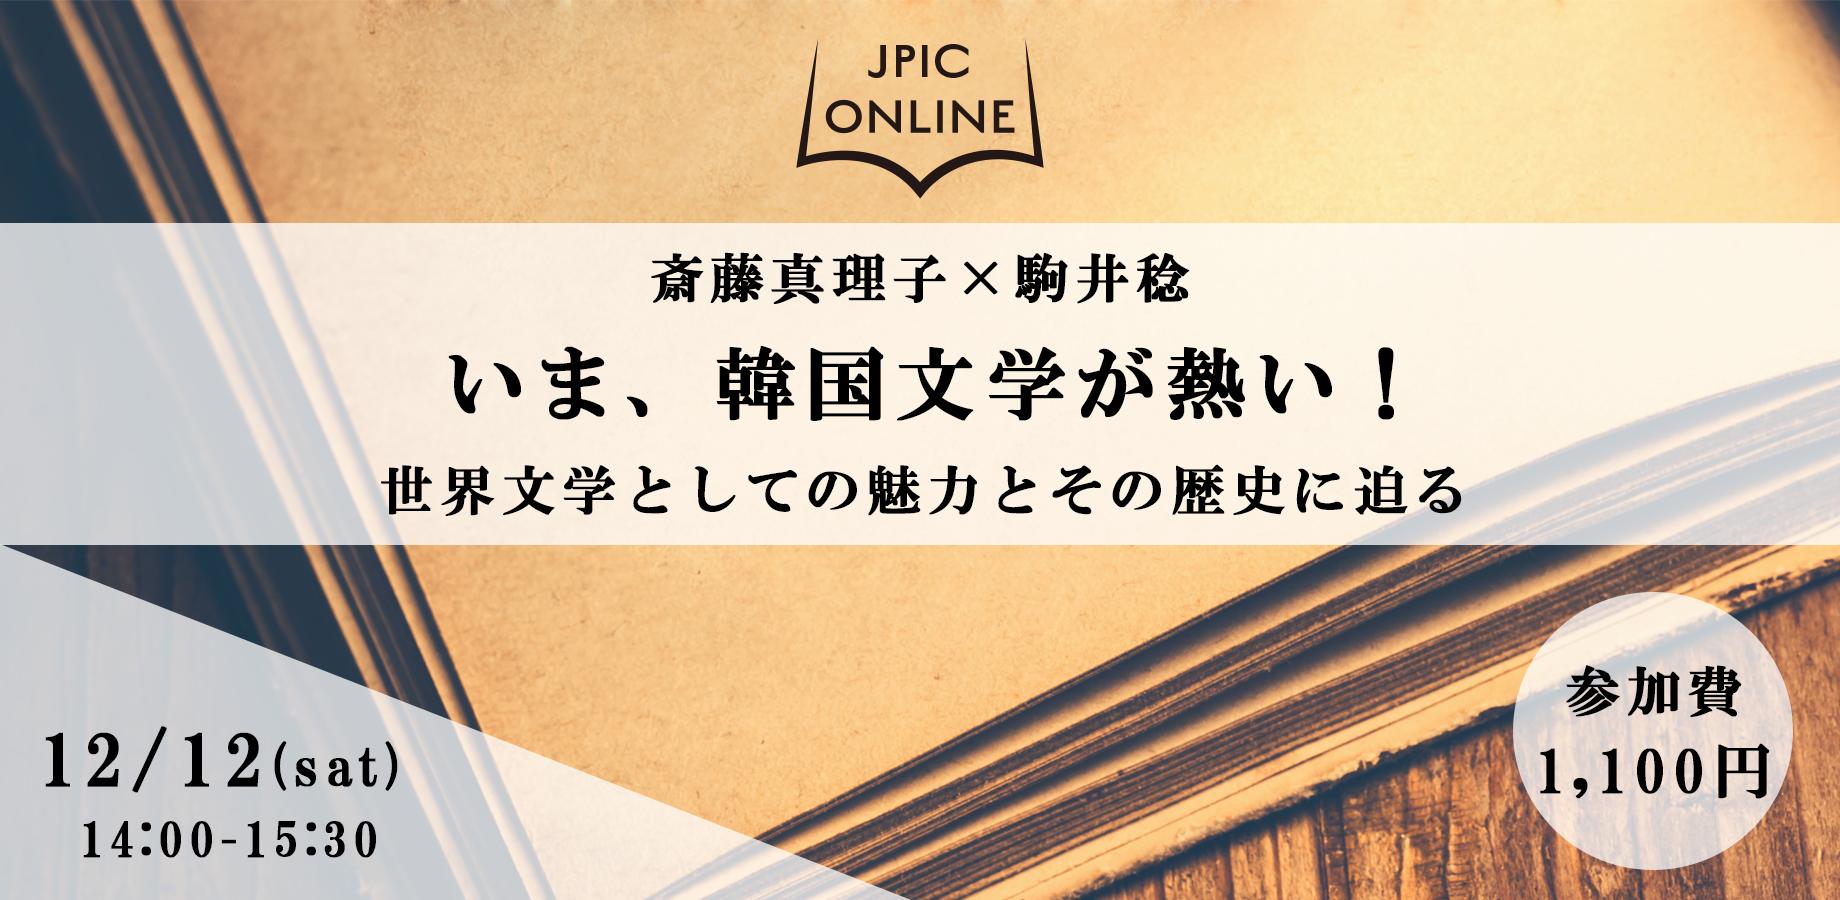 20201212JPIC ONLINE.png